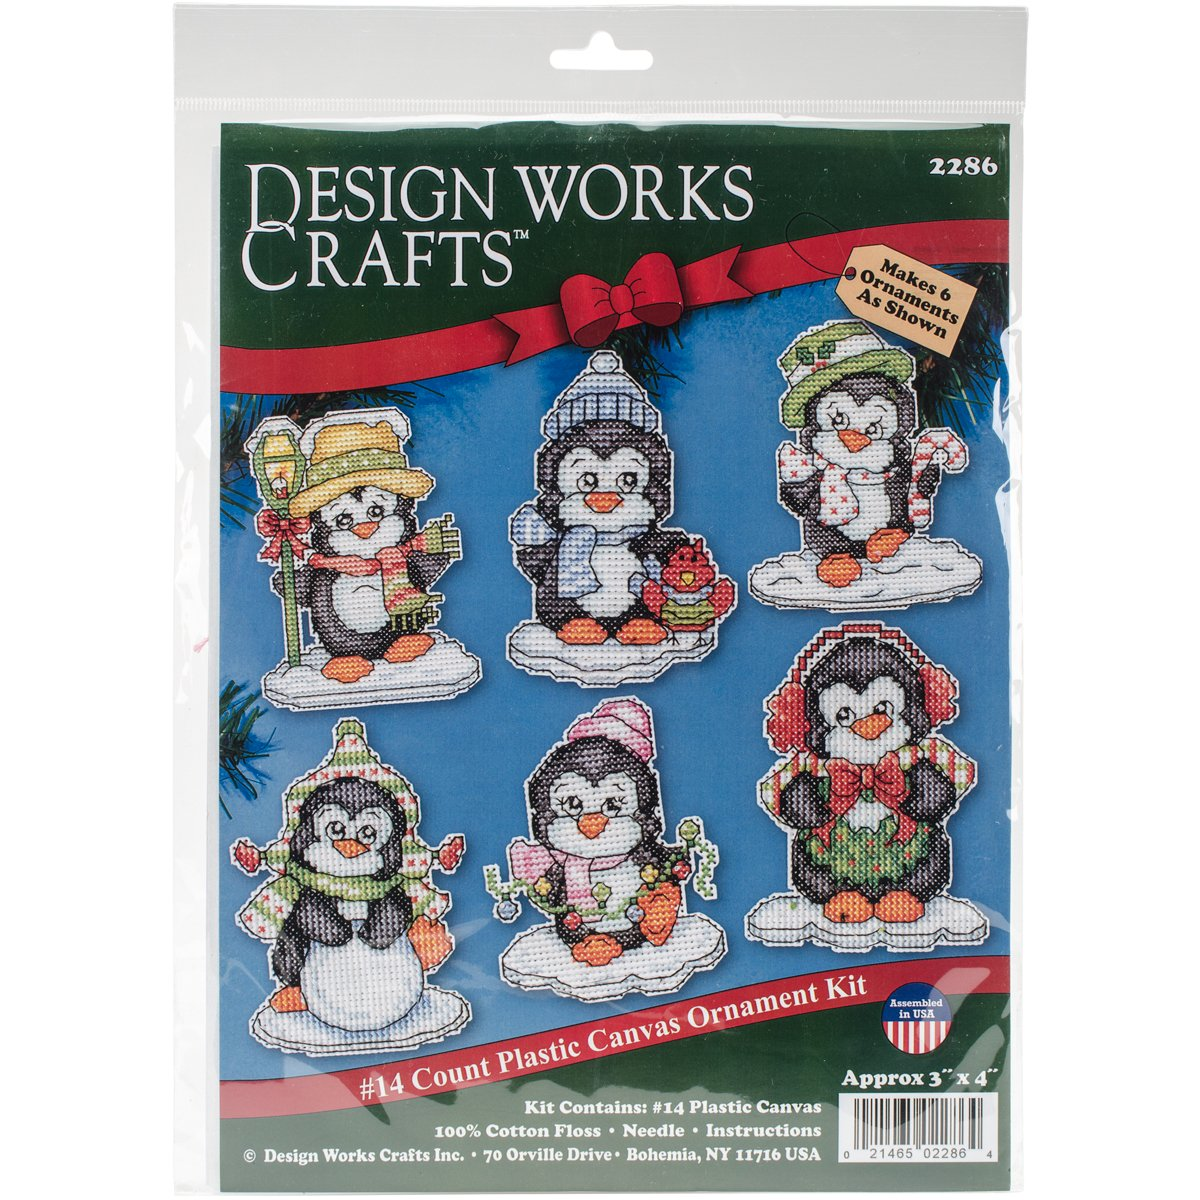 Design Works Crafts 3-1/2 Each Cross Stitch Ornament Kit, Penguins on Ice Inc. 2286